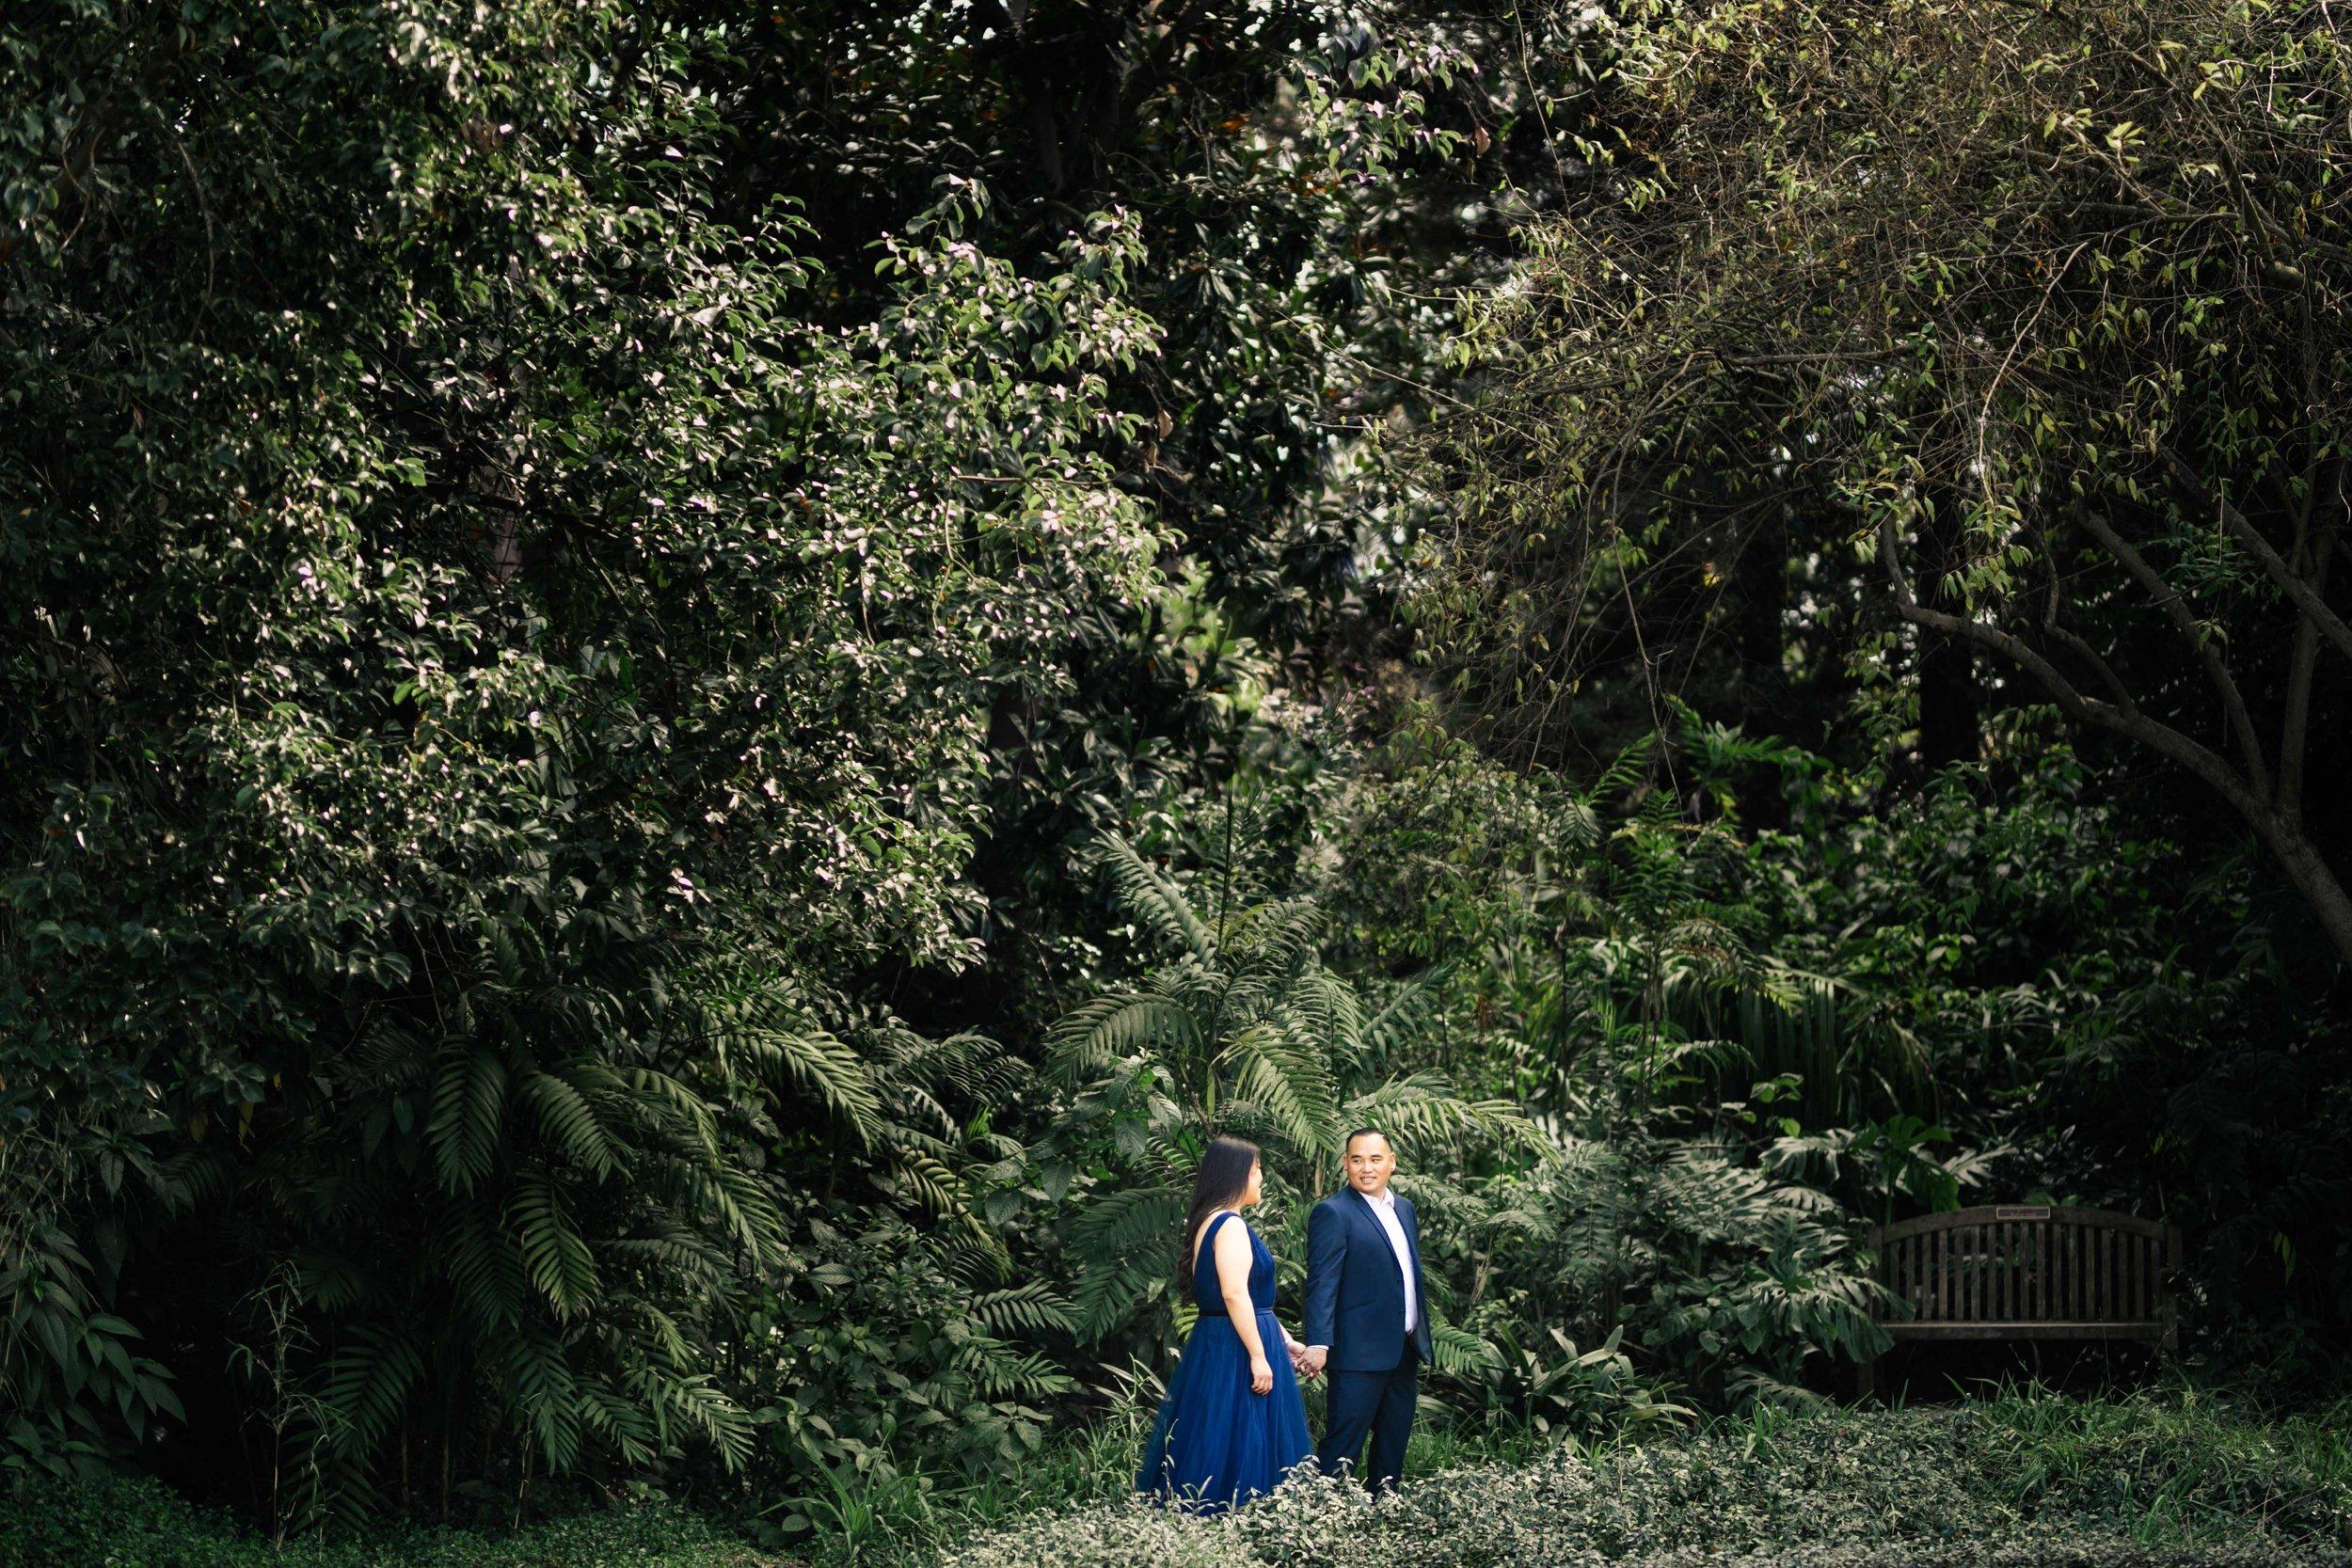 los_angeles_arboretum_engagement_joshuachun_photography_-2.JPG